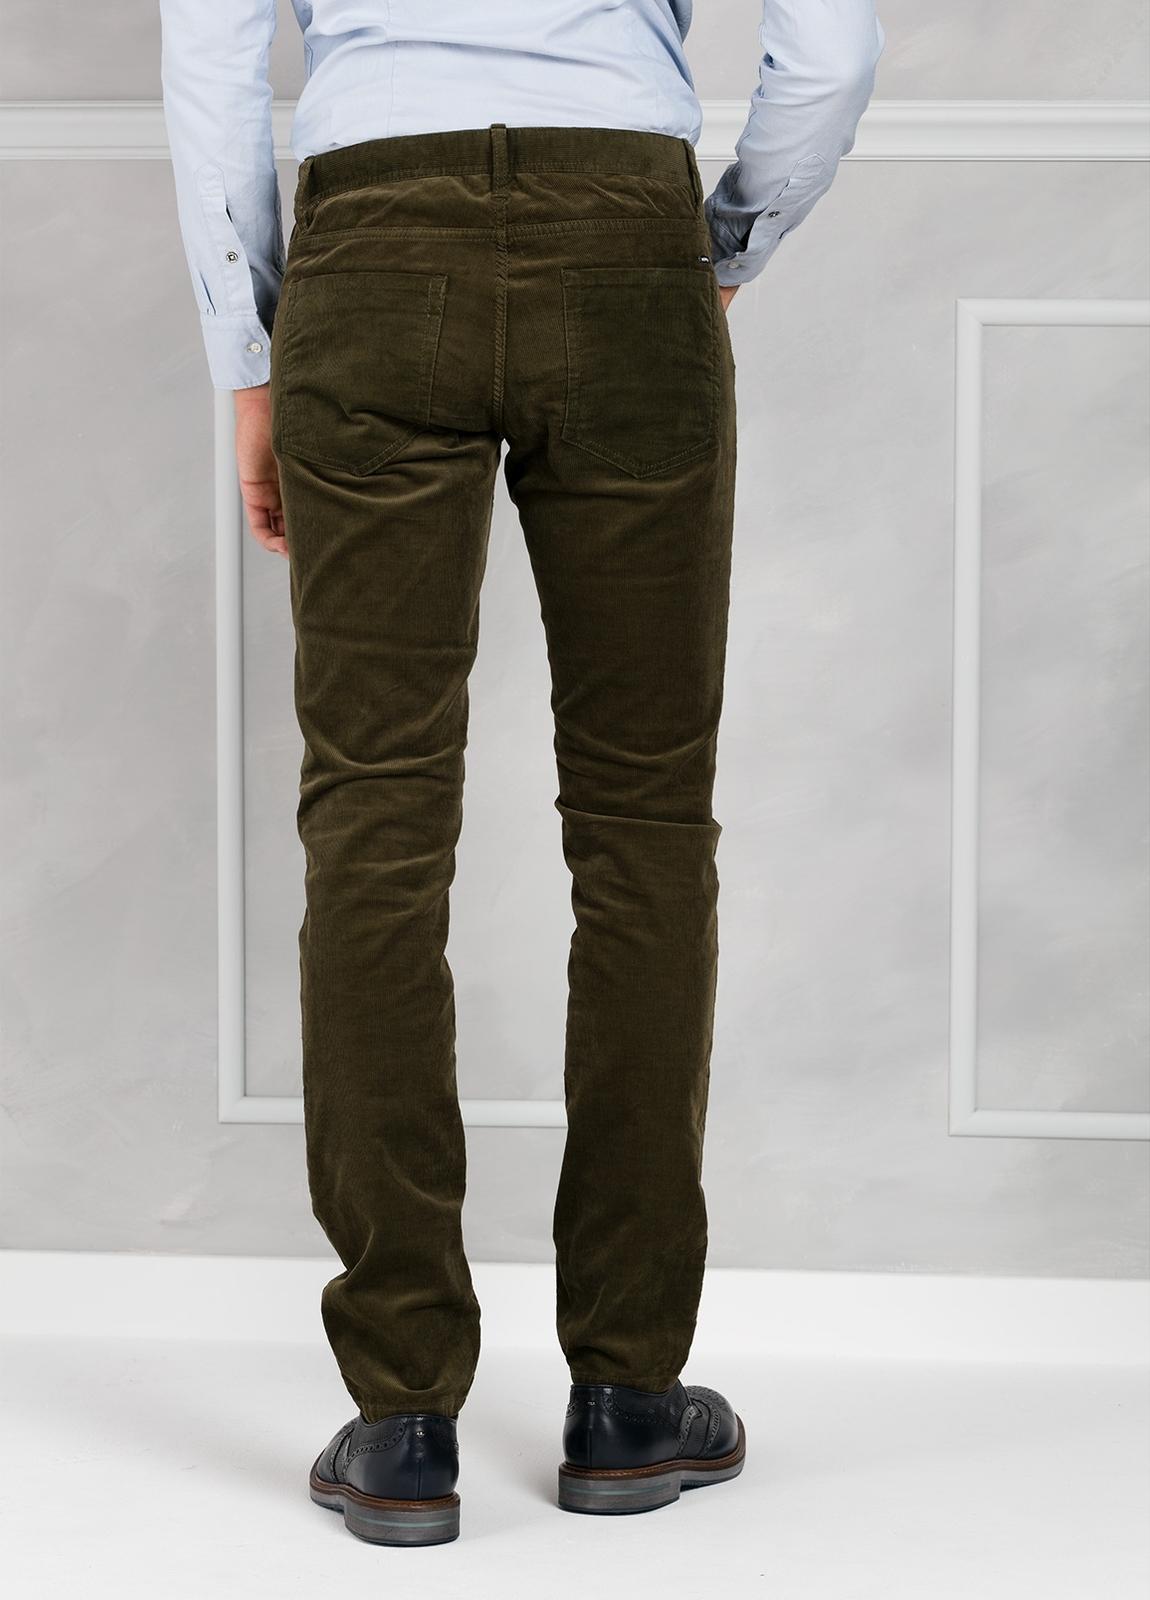 Pantalón 5 bolsillos micropana modelo FRED color kaki. 98% Algodón 2% Elastano. - Ítem2